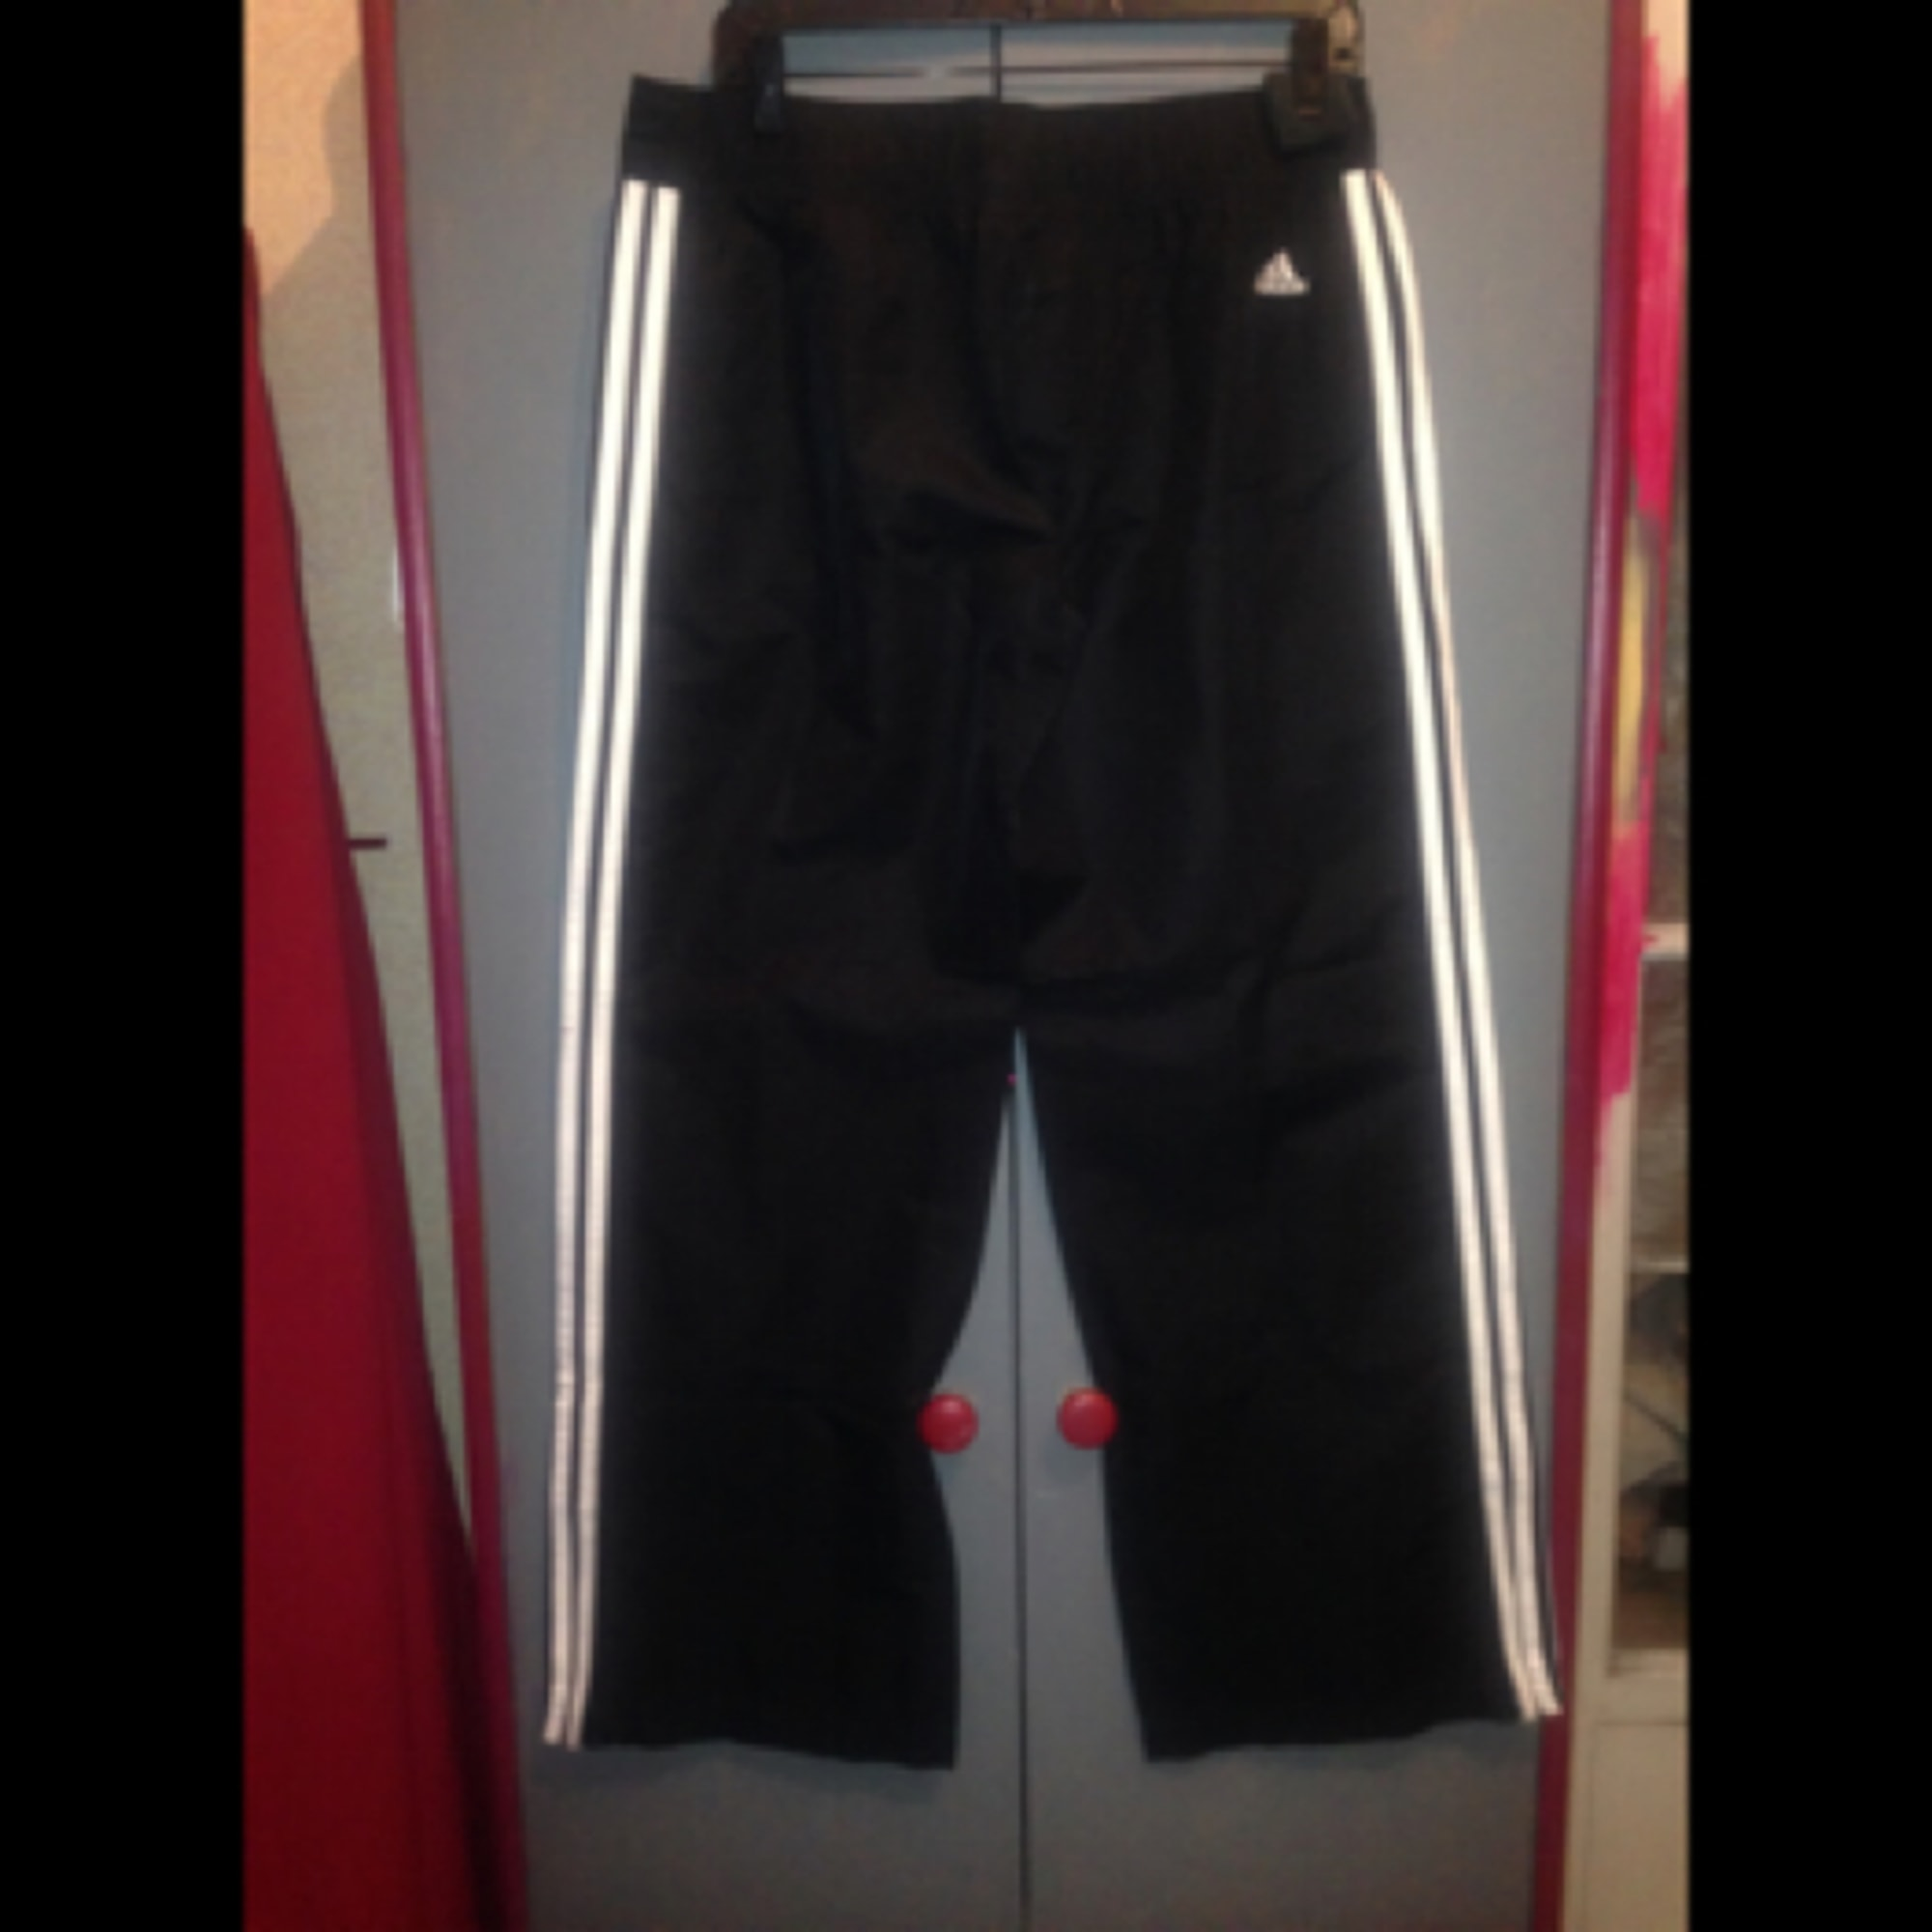 pantaloni adidas larghi